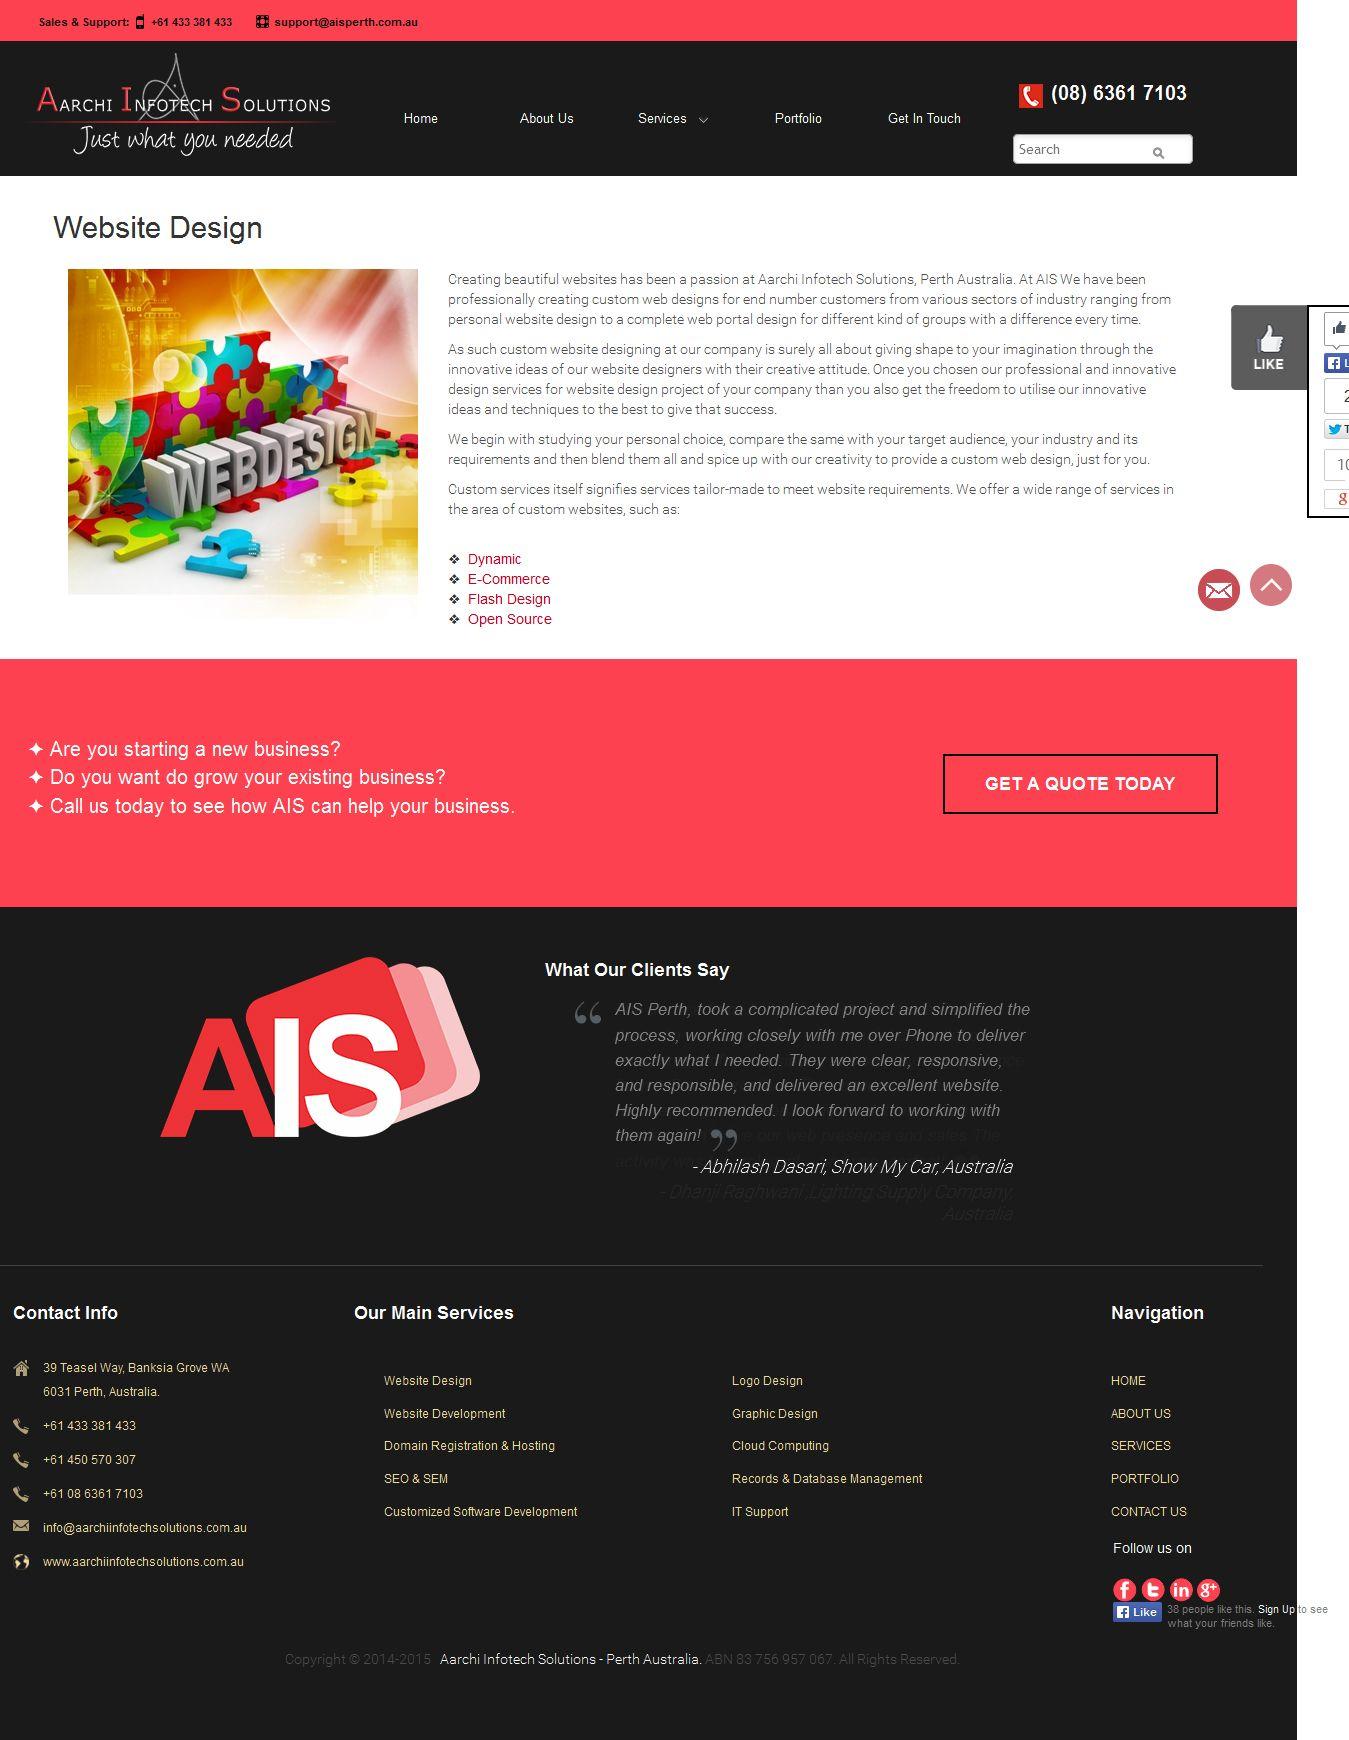 Creative web digital crm erp software solutions